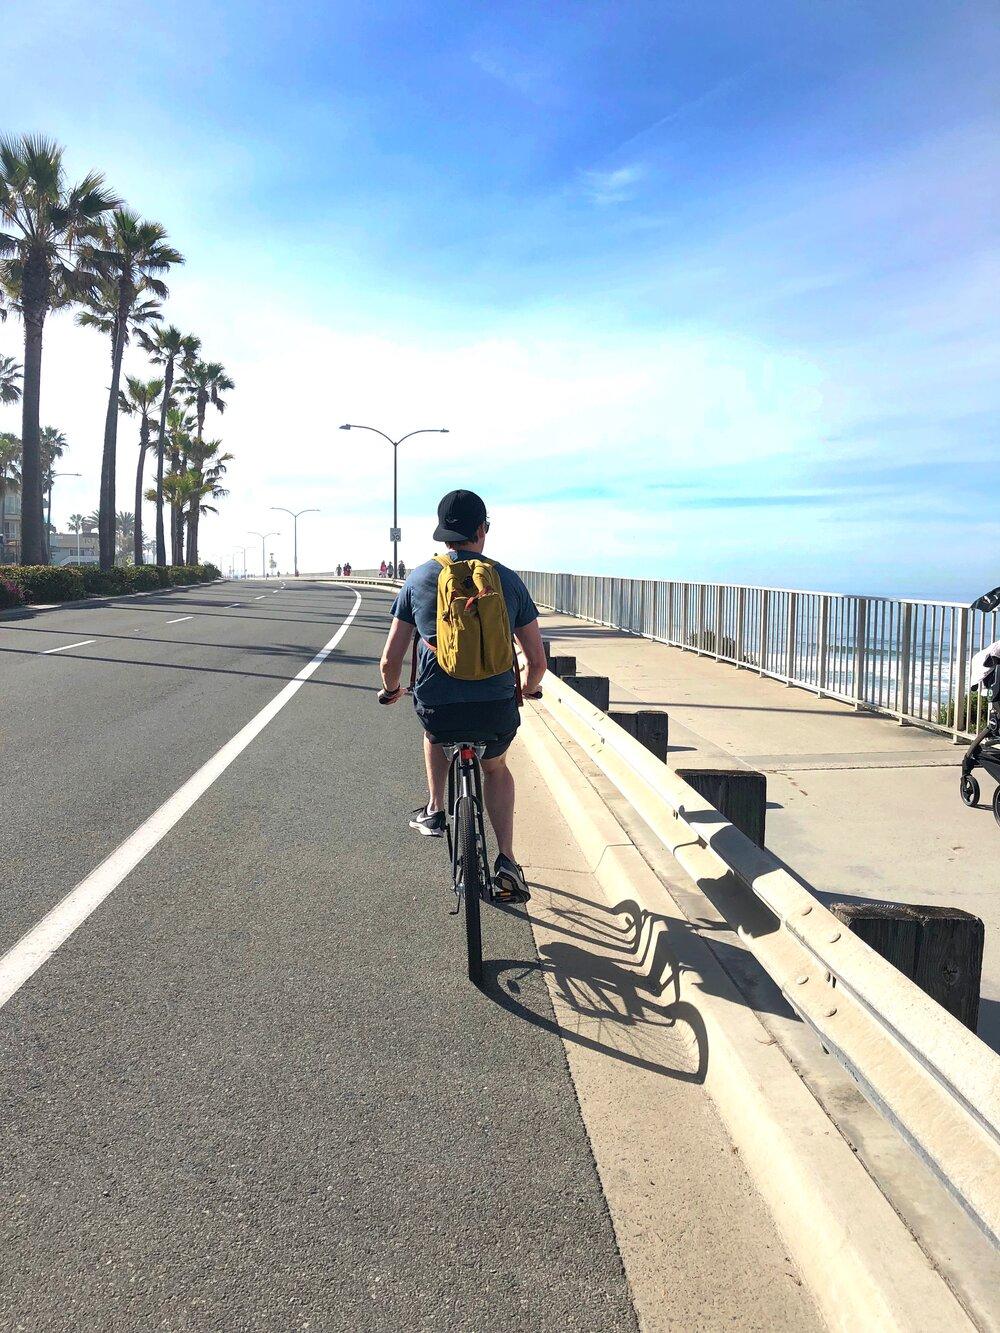 carlsbad_bike_ride.jpg